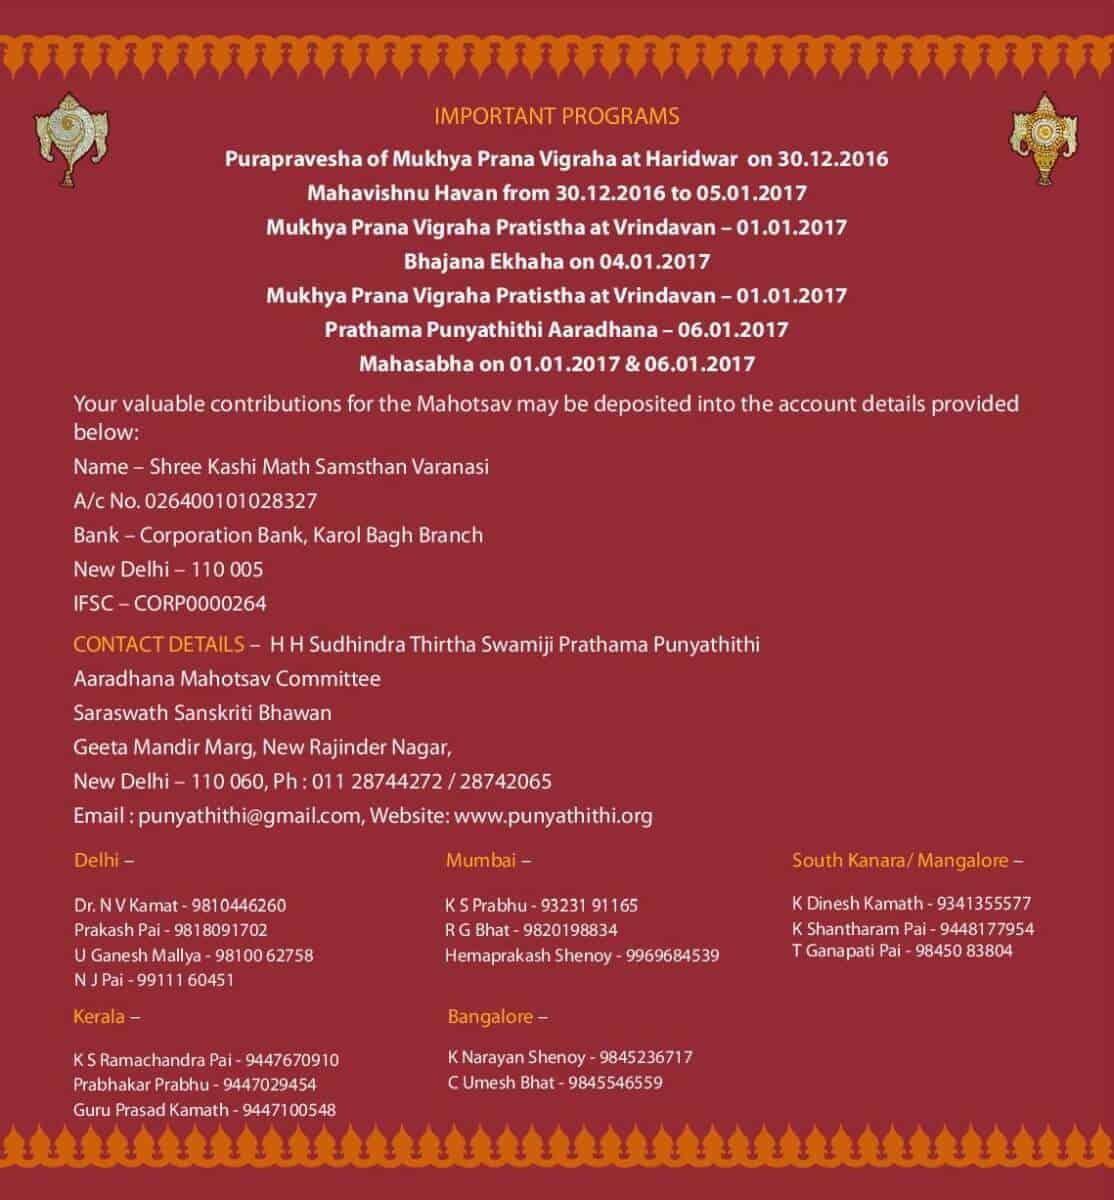 Prathama Punyatithi Aradhana Mahotsav